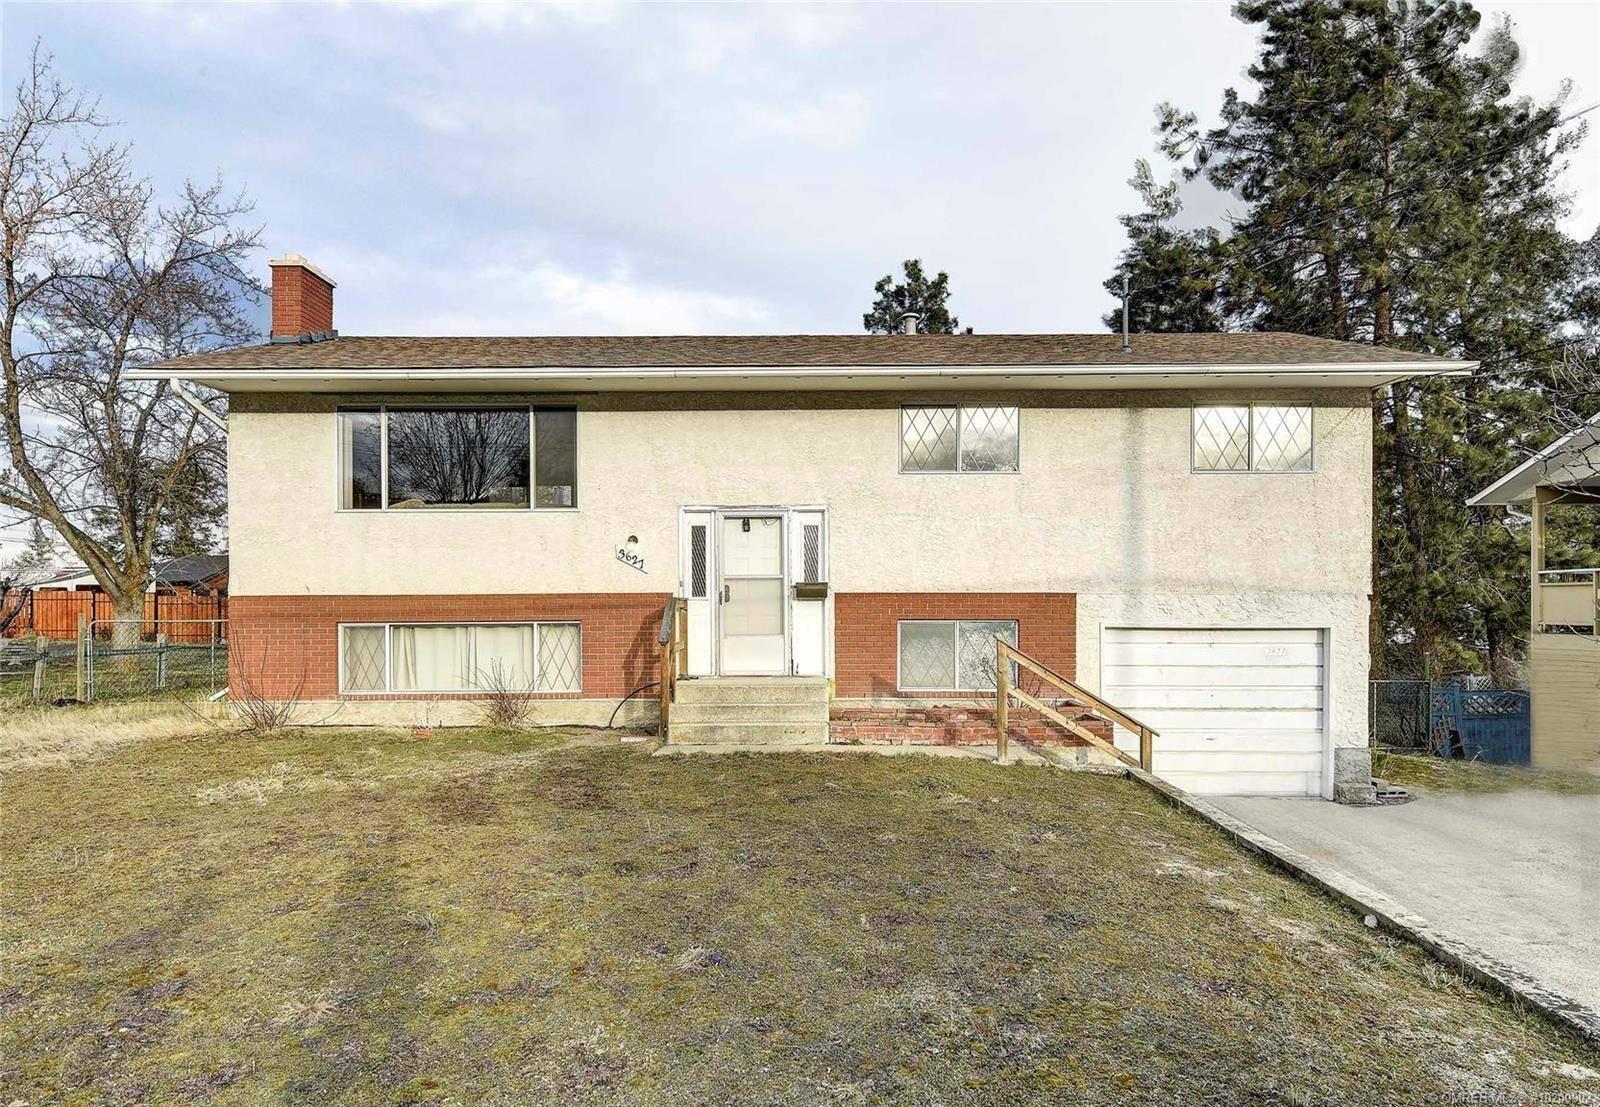 House for sale at 3627 Dunbarton Rd West Kelowna British Columbia - MLS: 10200902